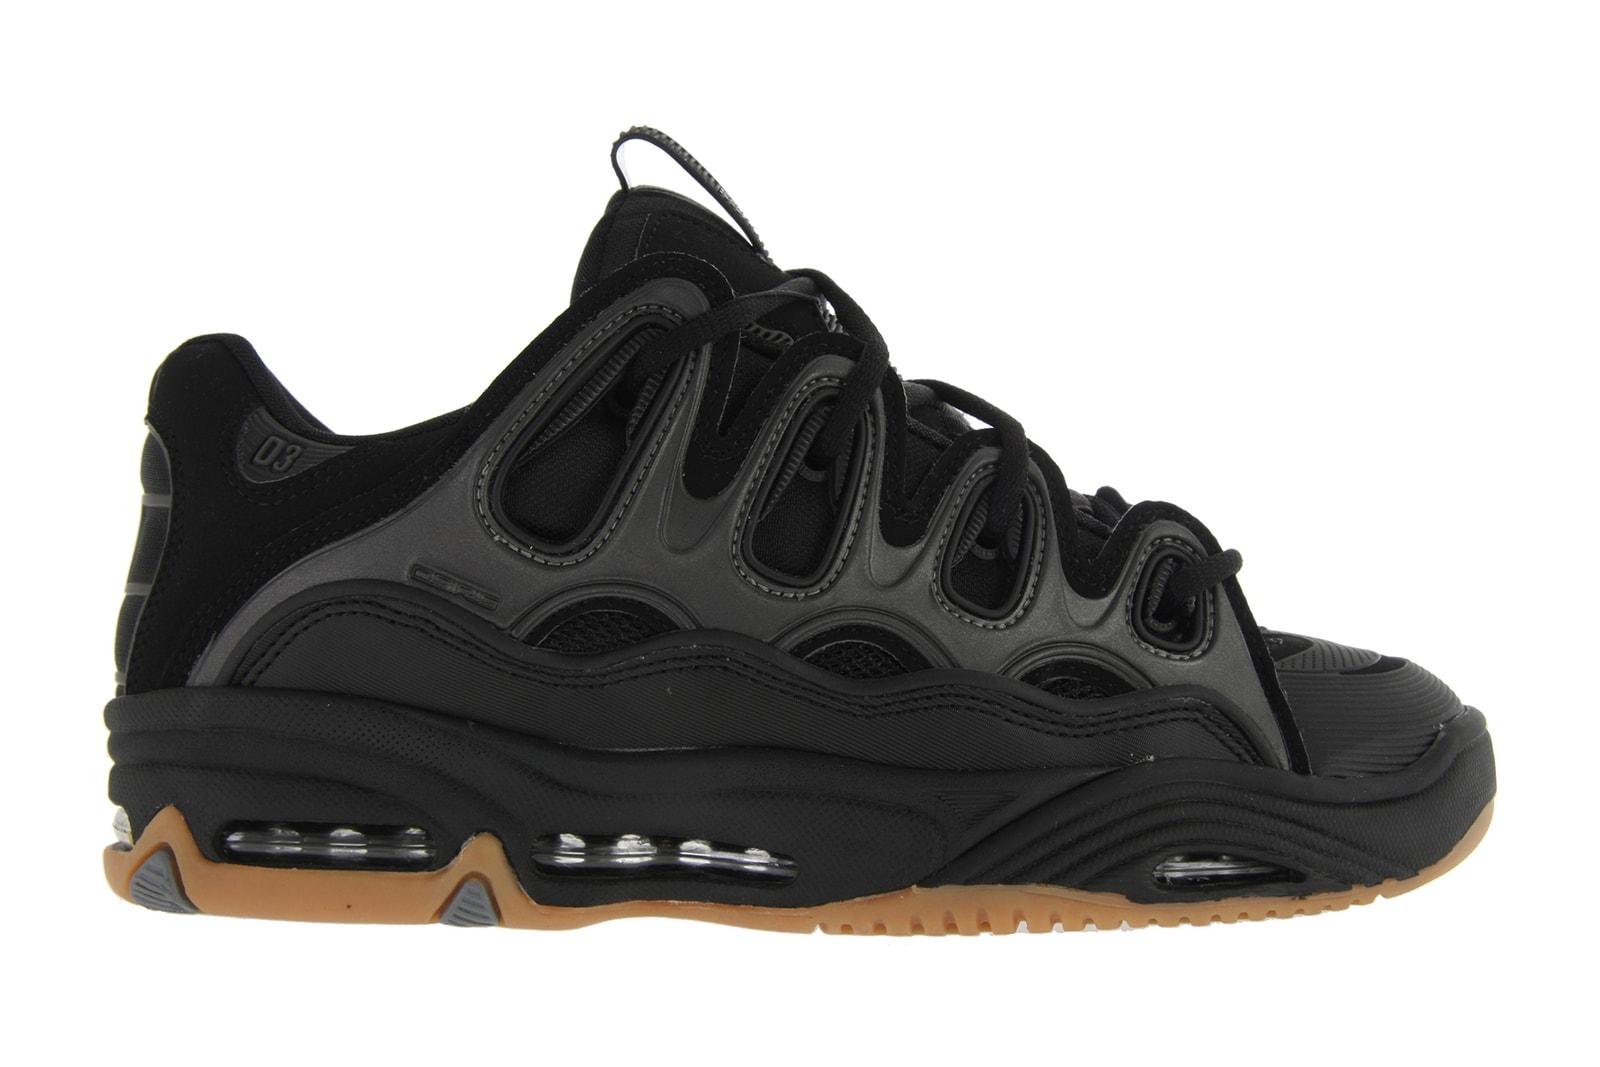 A$AP Rocky 加持入局,鬆糕鞋或將成全新 Sneaker Trend?